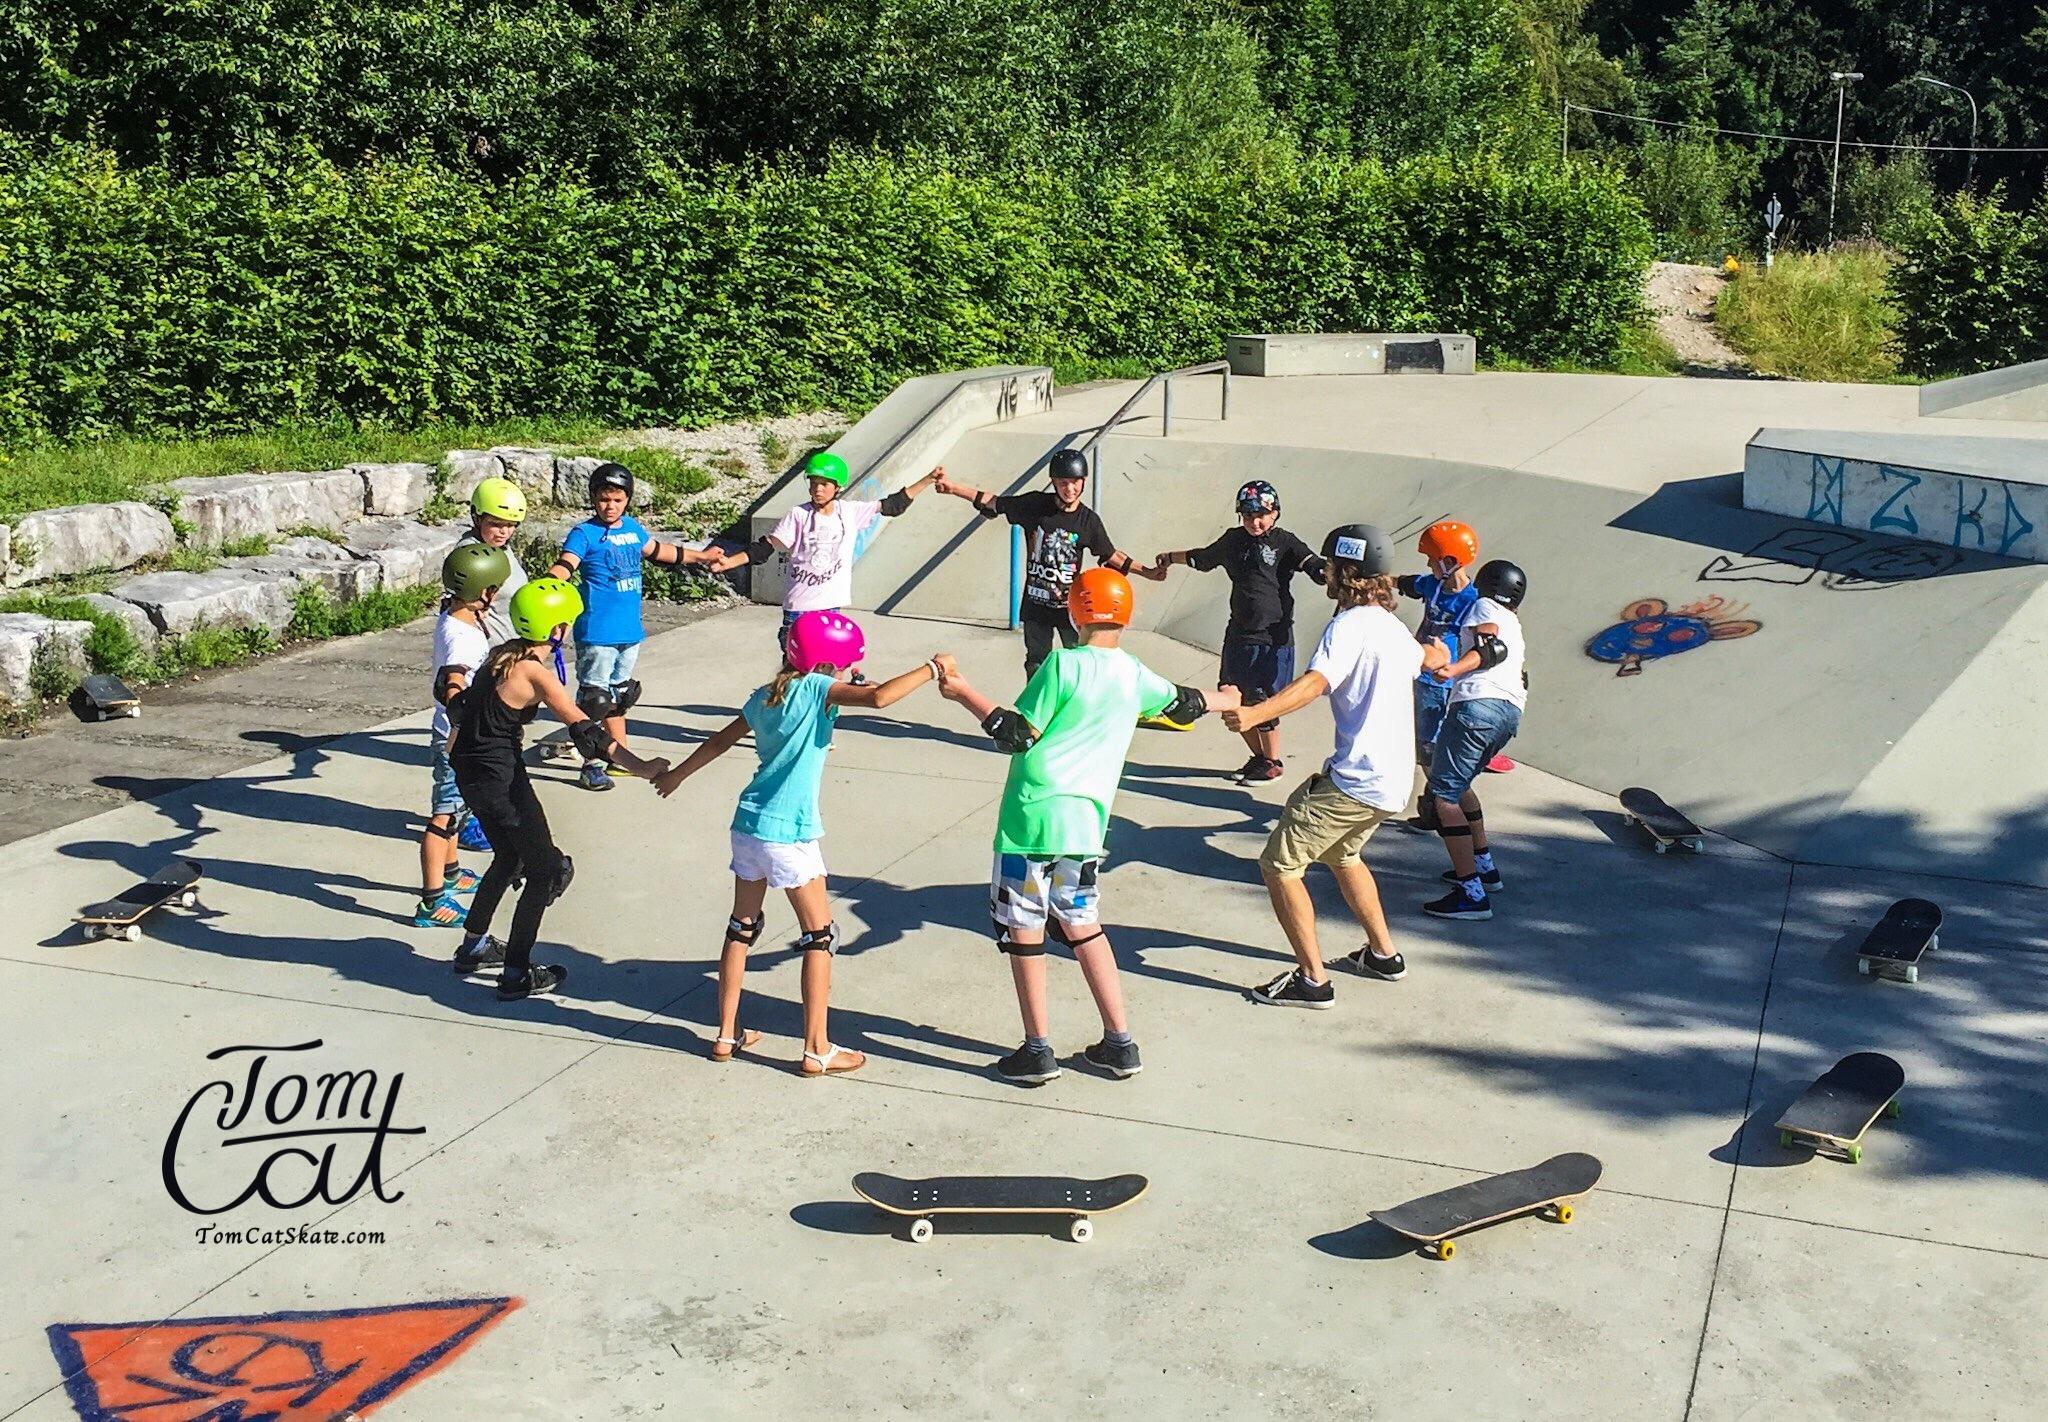 Skatekurs Bad Tölz Skaten Lernen mit Profi Tom Cat auch Longboardkurse im raum München, Bad Tölz, Lenggries  4.JPG